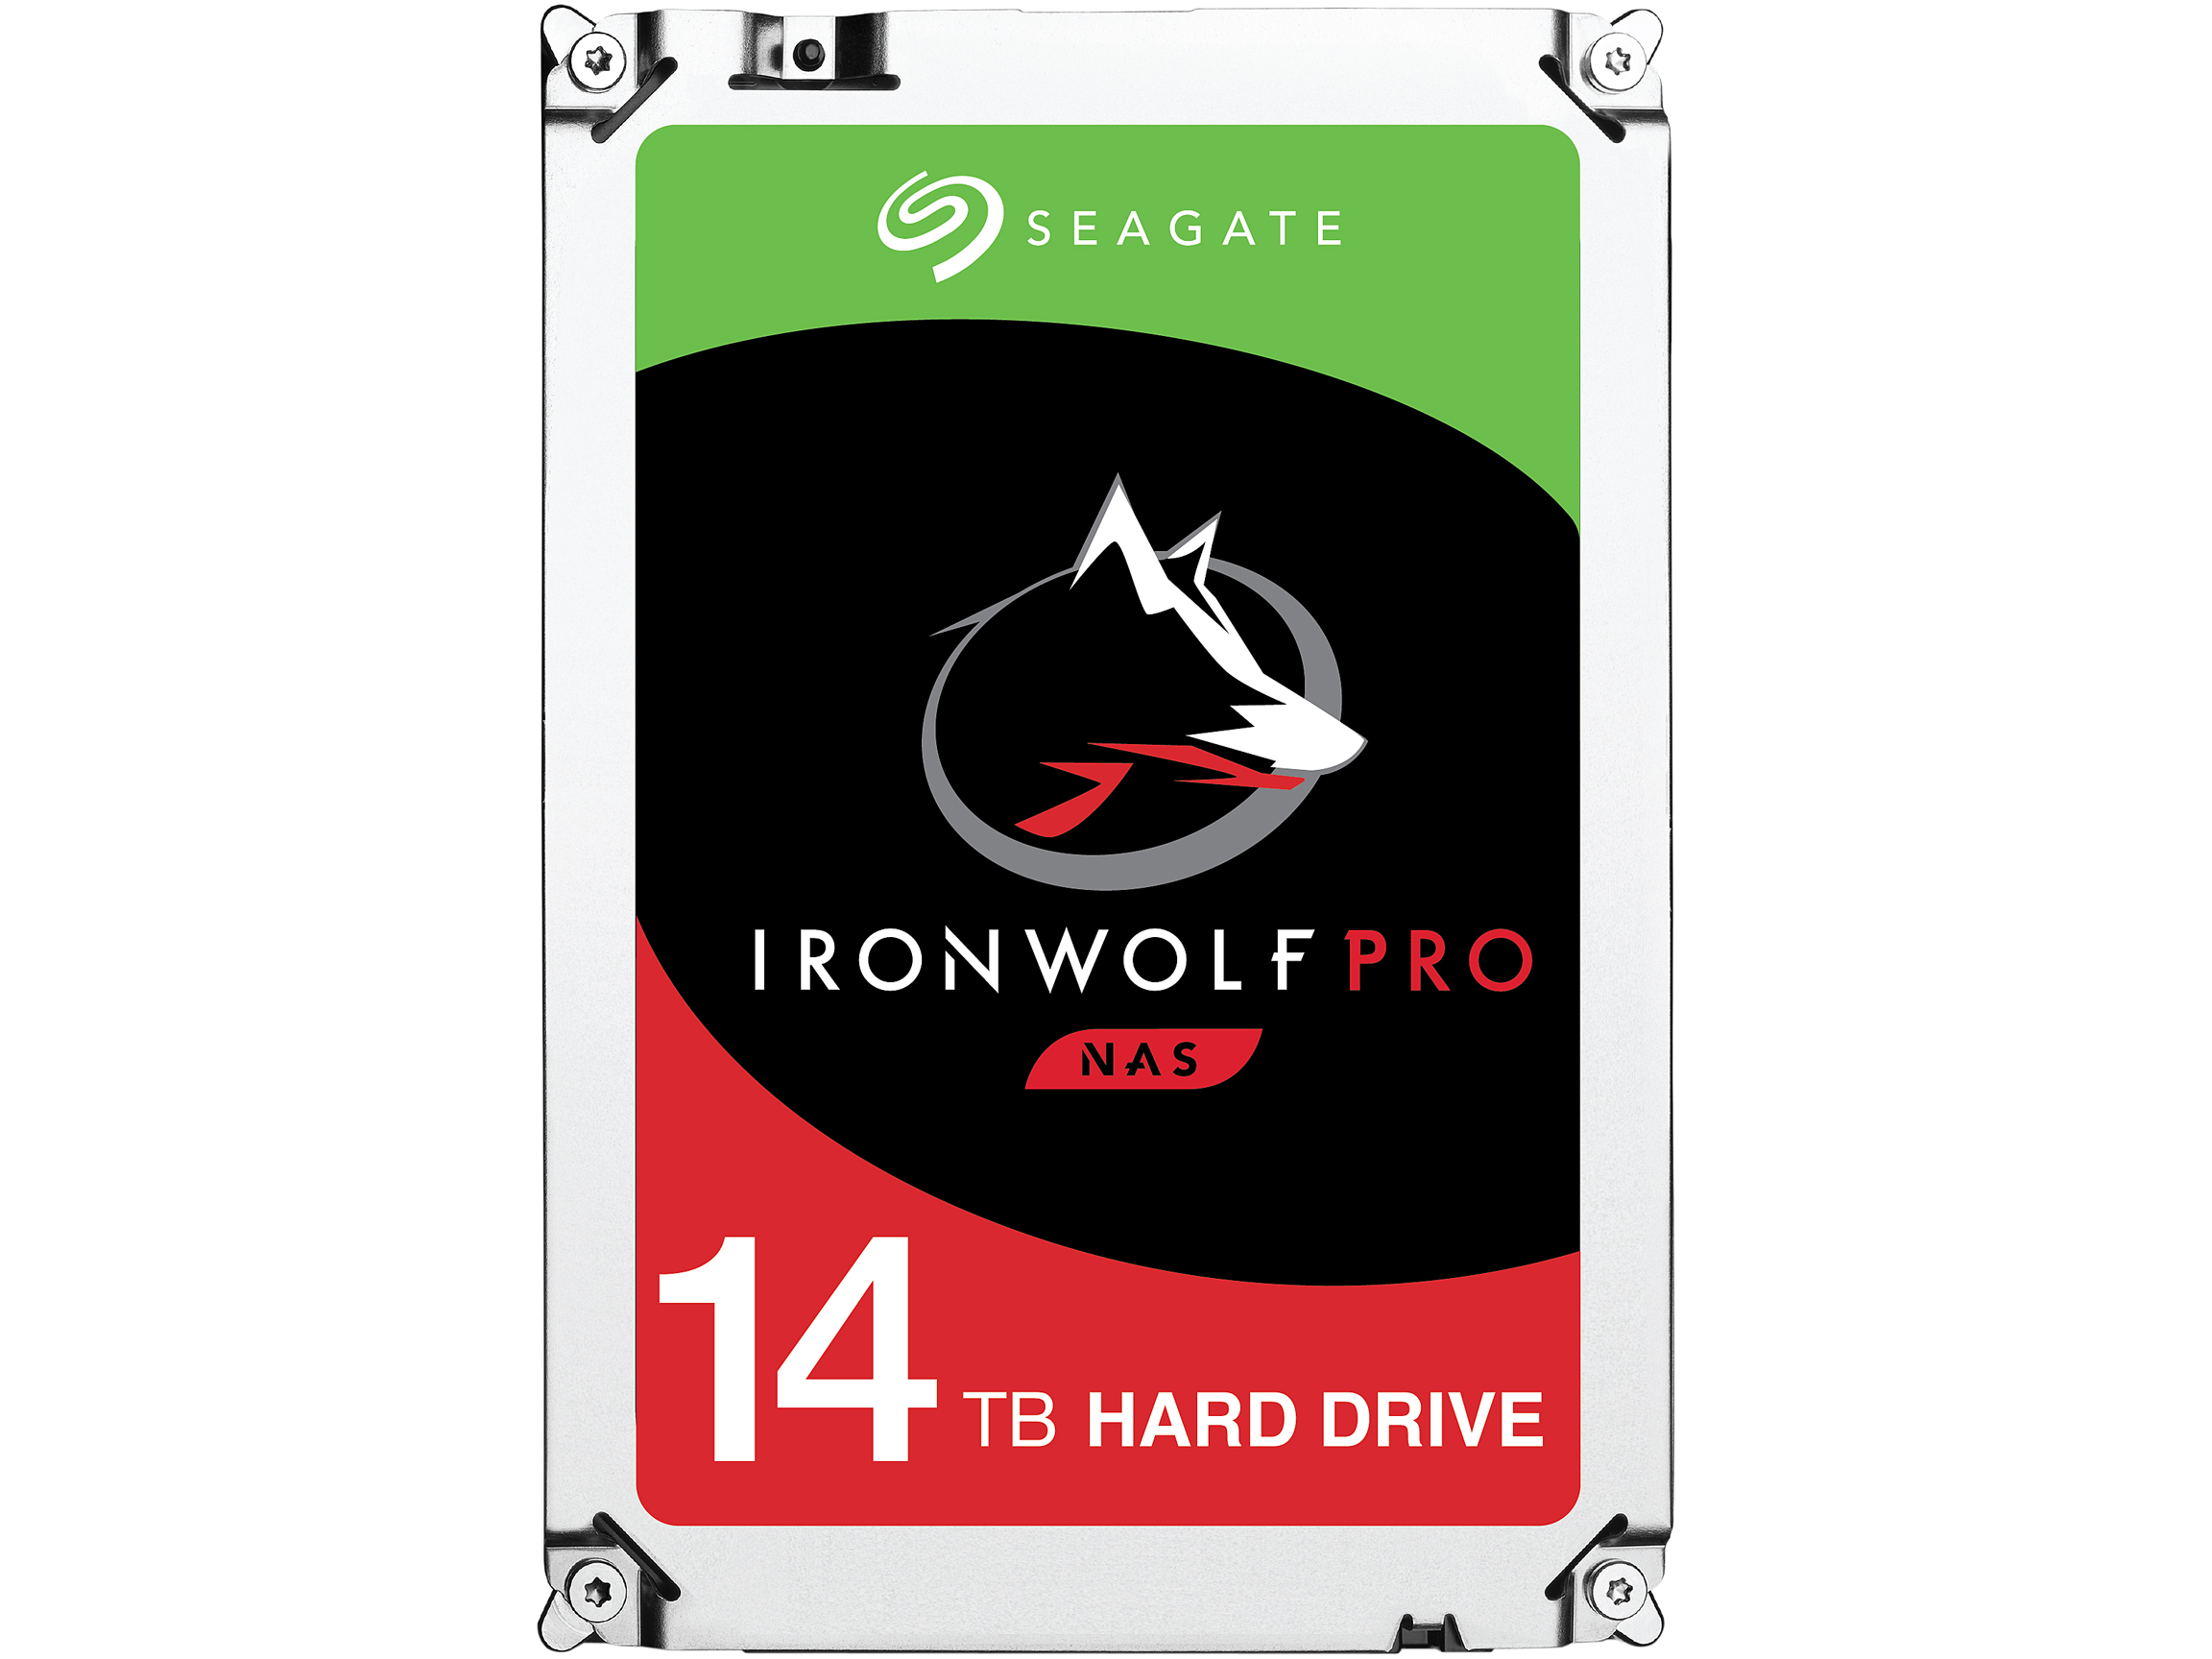 Seagate IronWolf Pro 14TB NAS 7200 RPM 256MB Cache CMR SATA Hard Drive ST14000NE0008